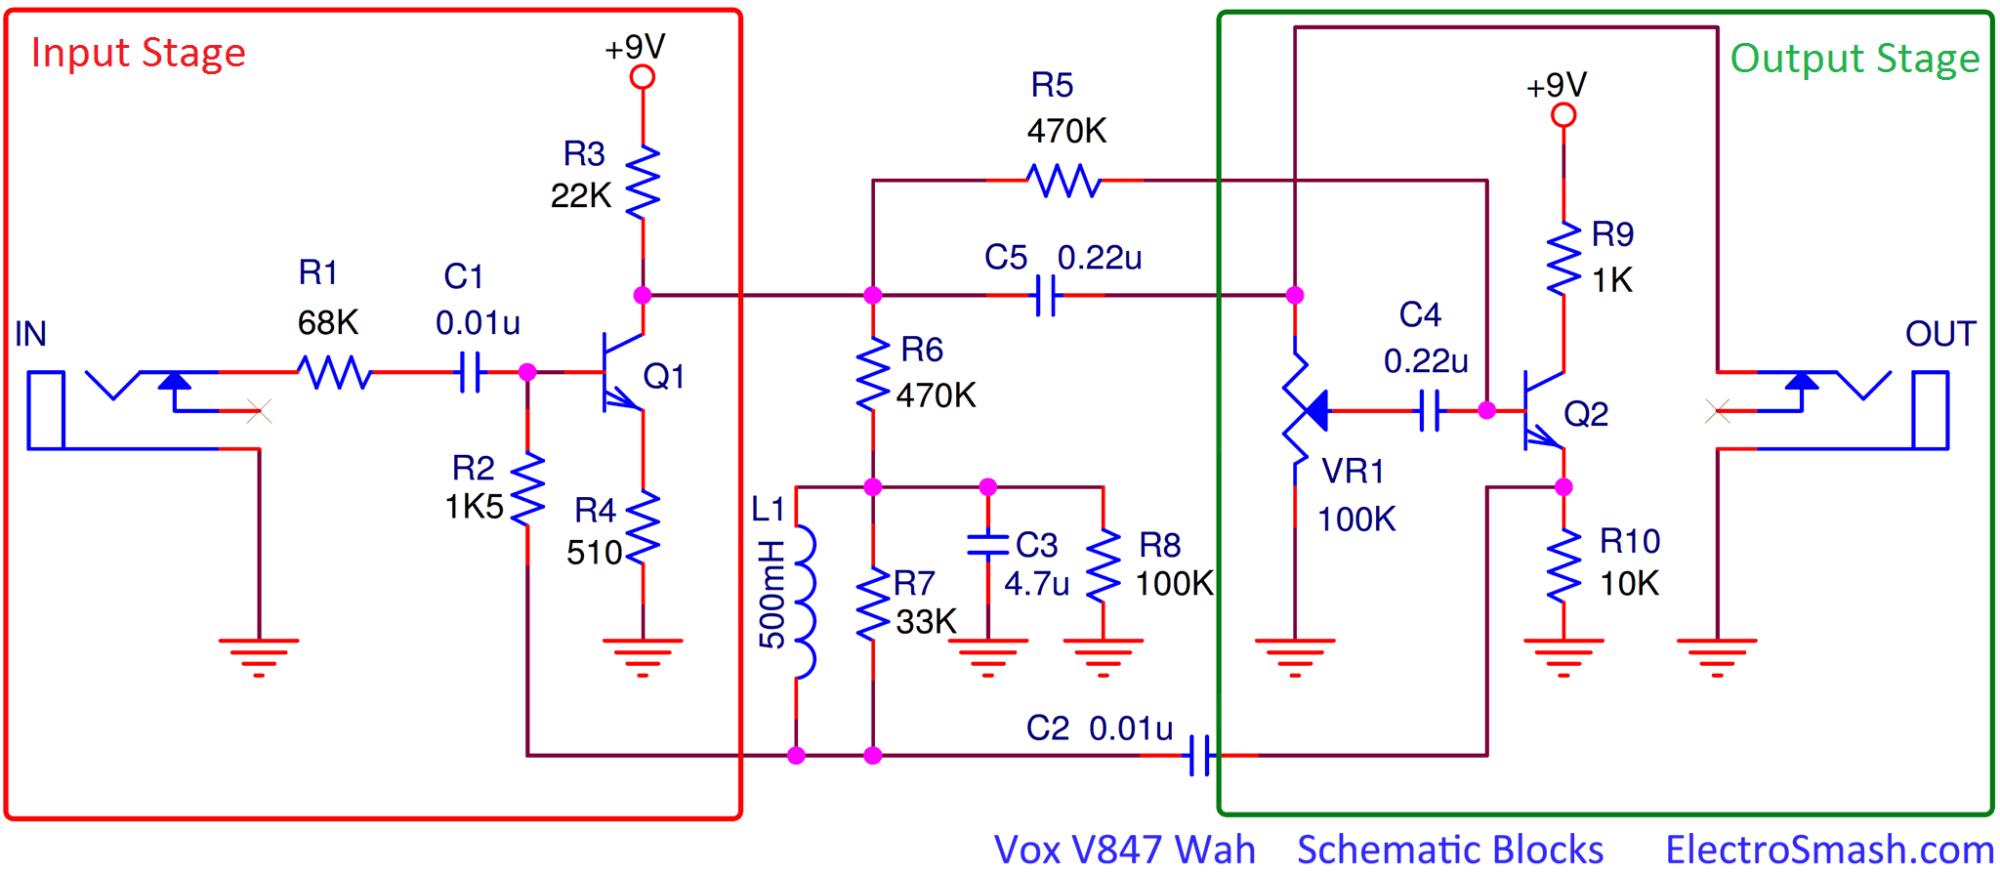 hight resolution of electrosmash vox v847 analysis vox wah pedal wiring diagram the vox v847 circuit